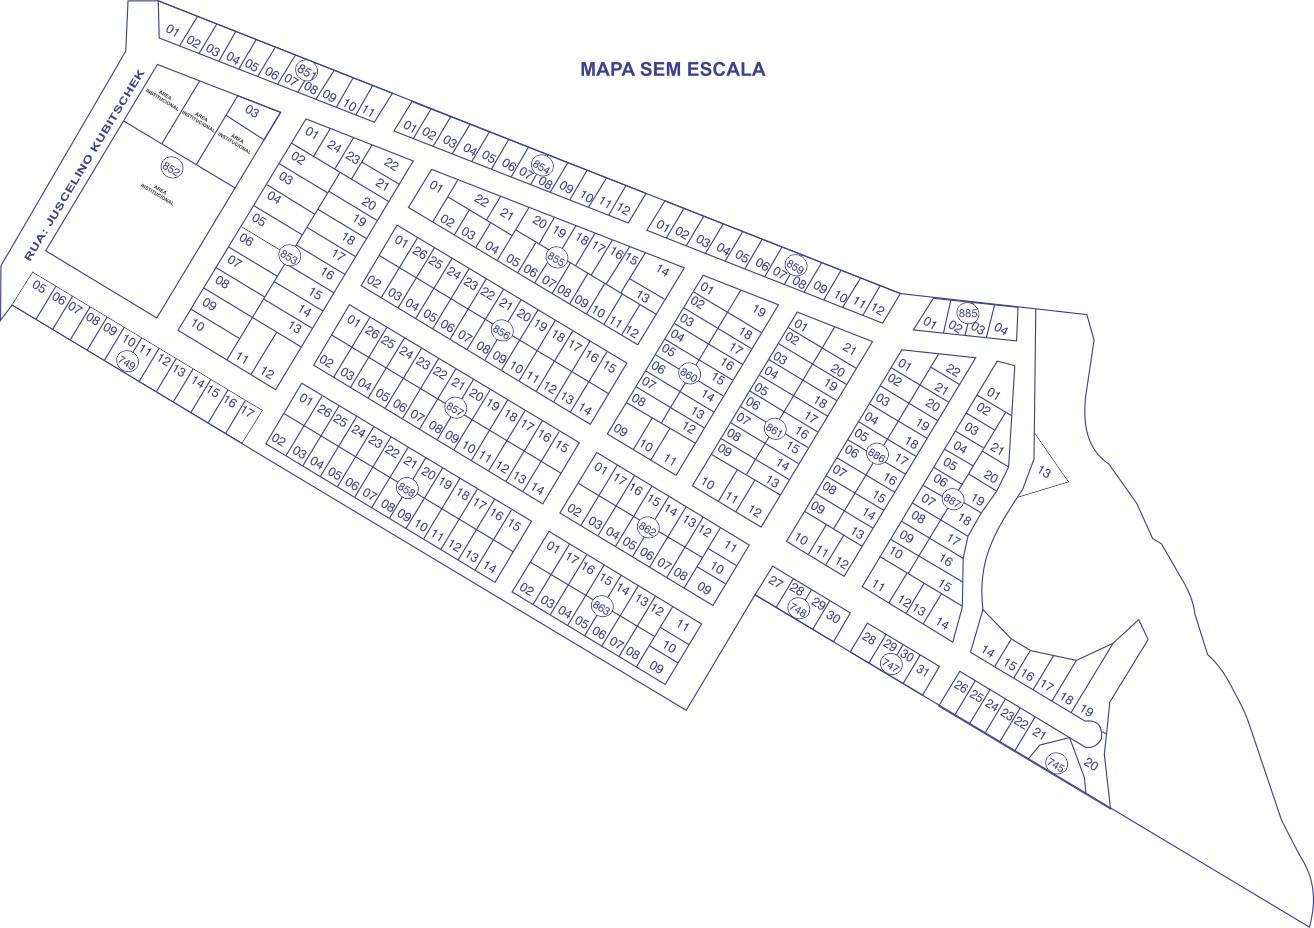 jd-casa-grande-palotina-mapa